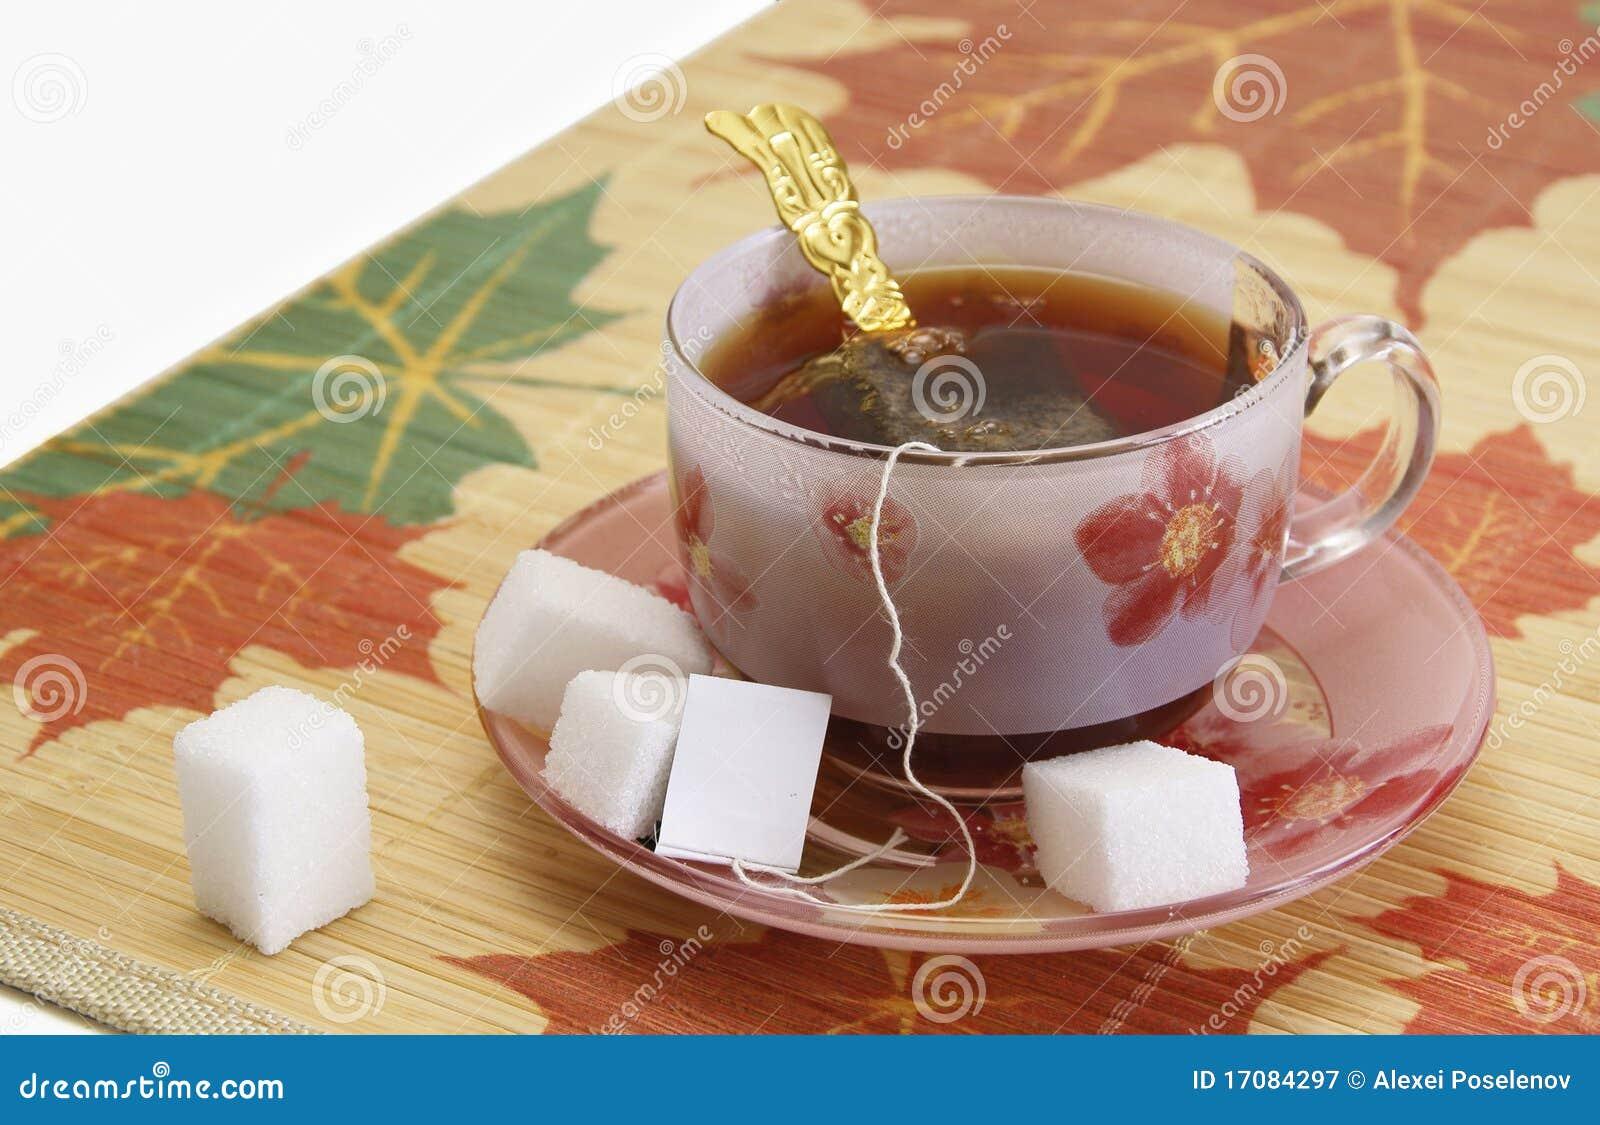 Чашек чаю и части сахара